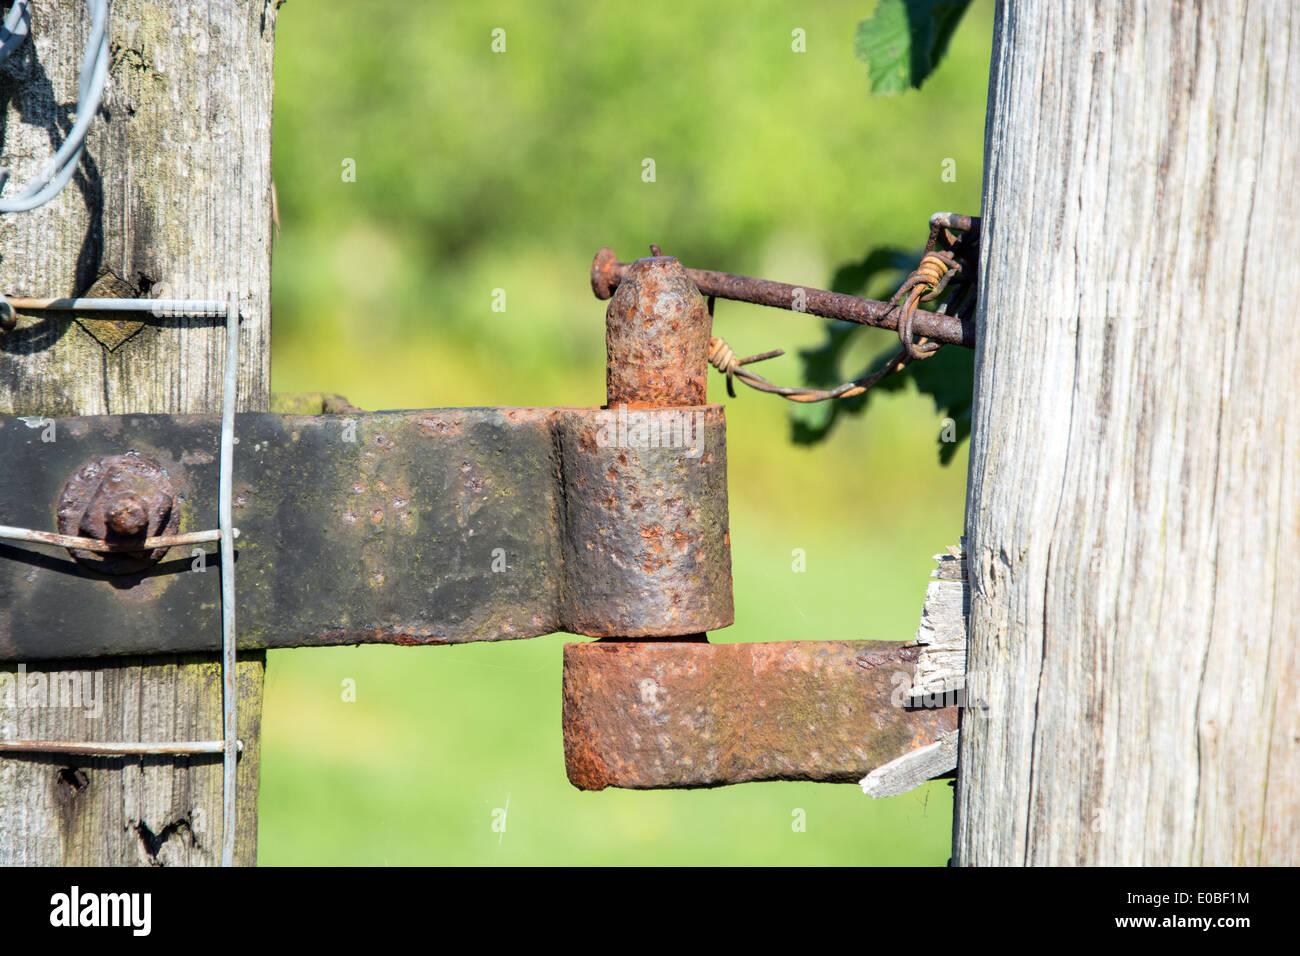 tor scharnier stockfoto, bild: 69094752 - alamy